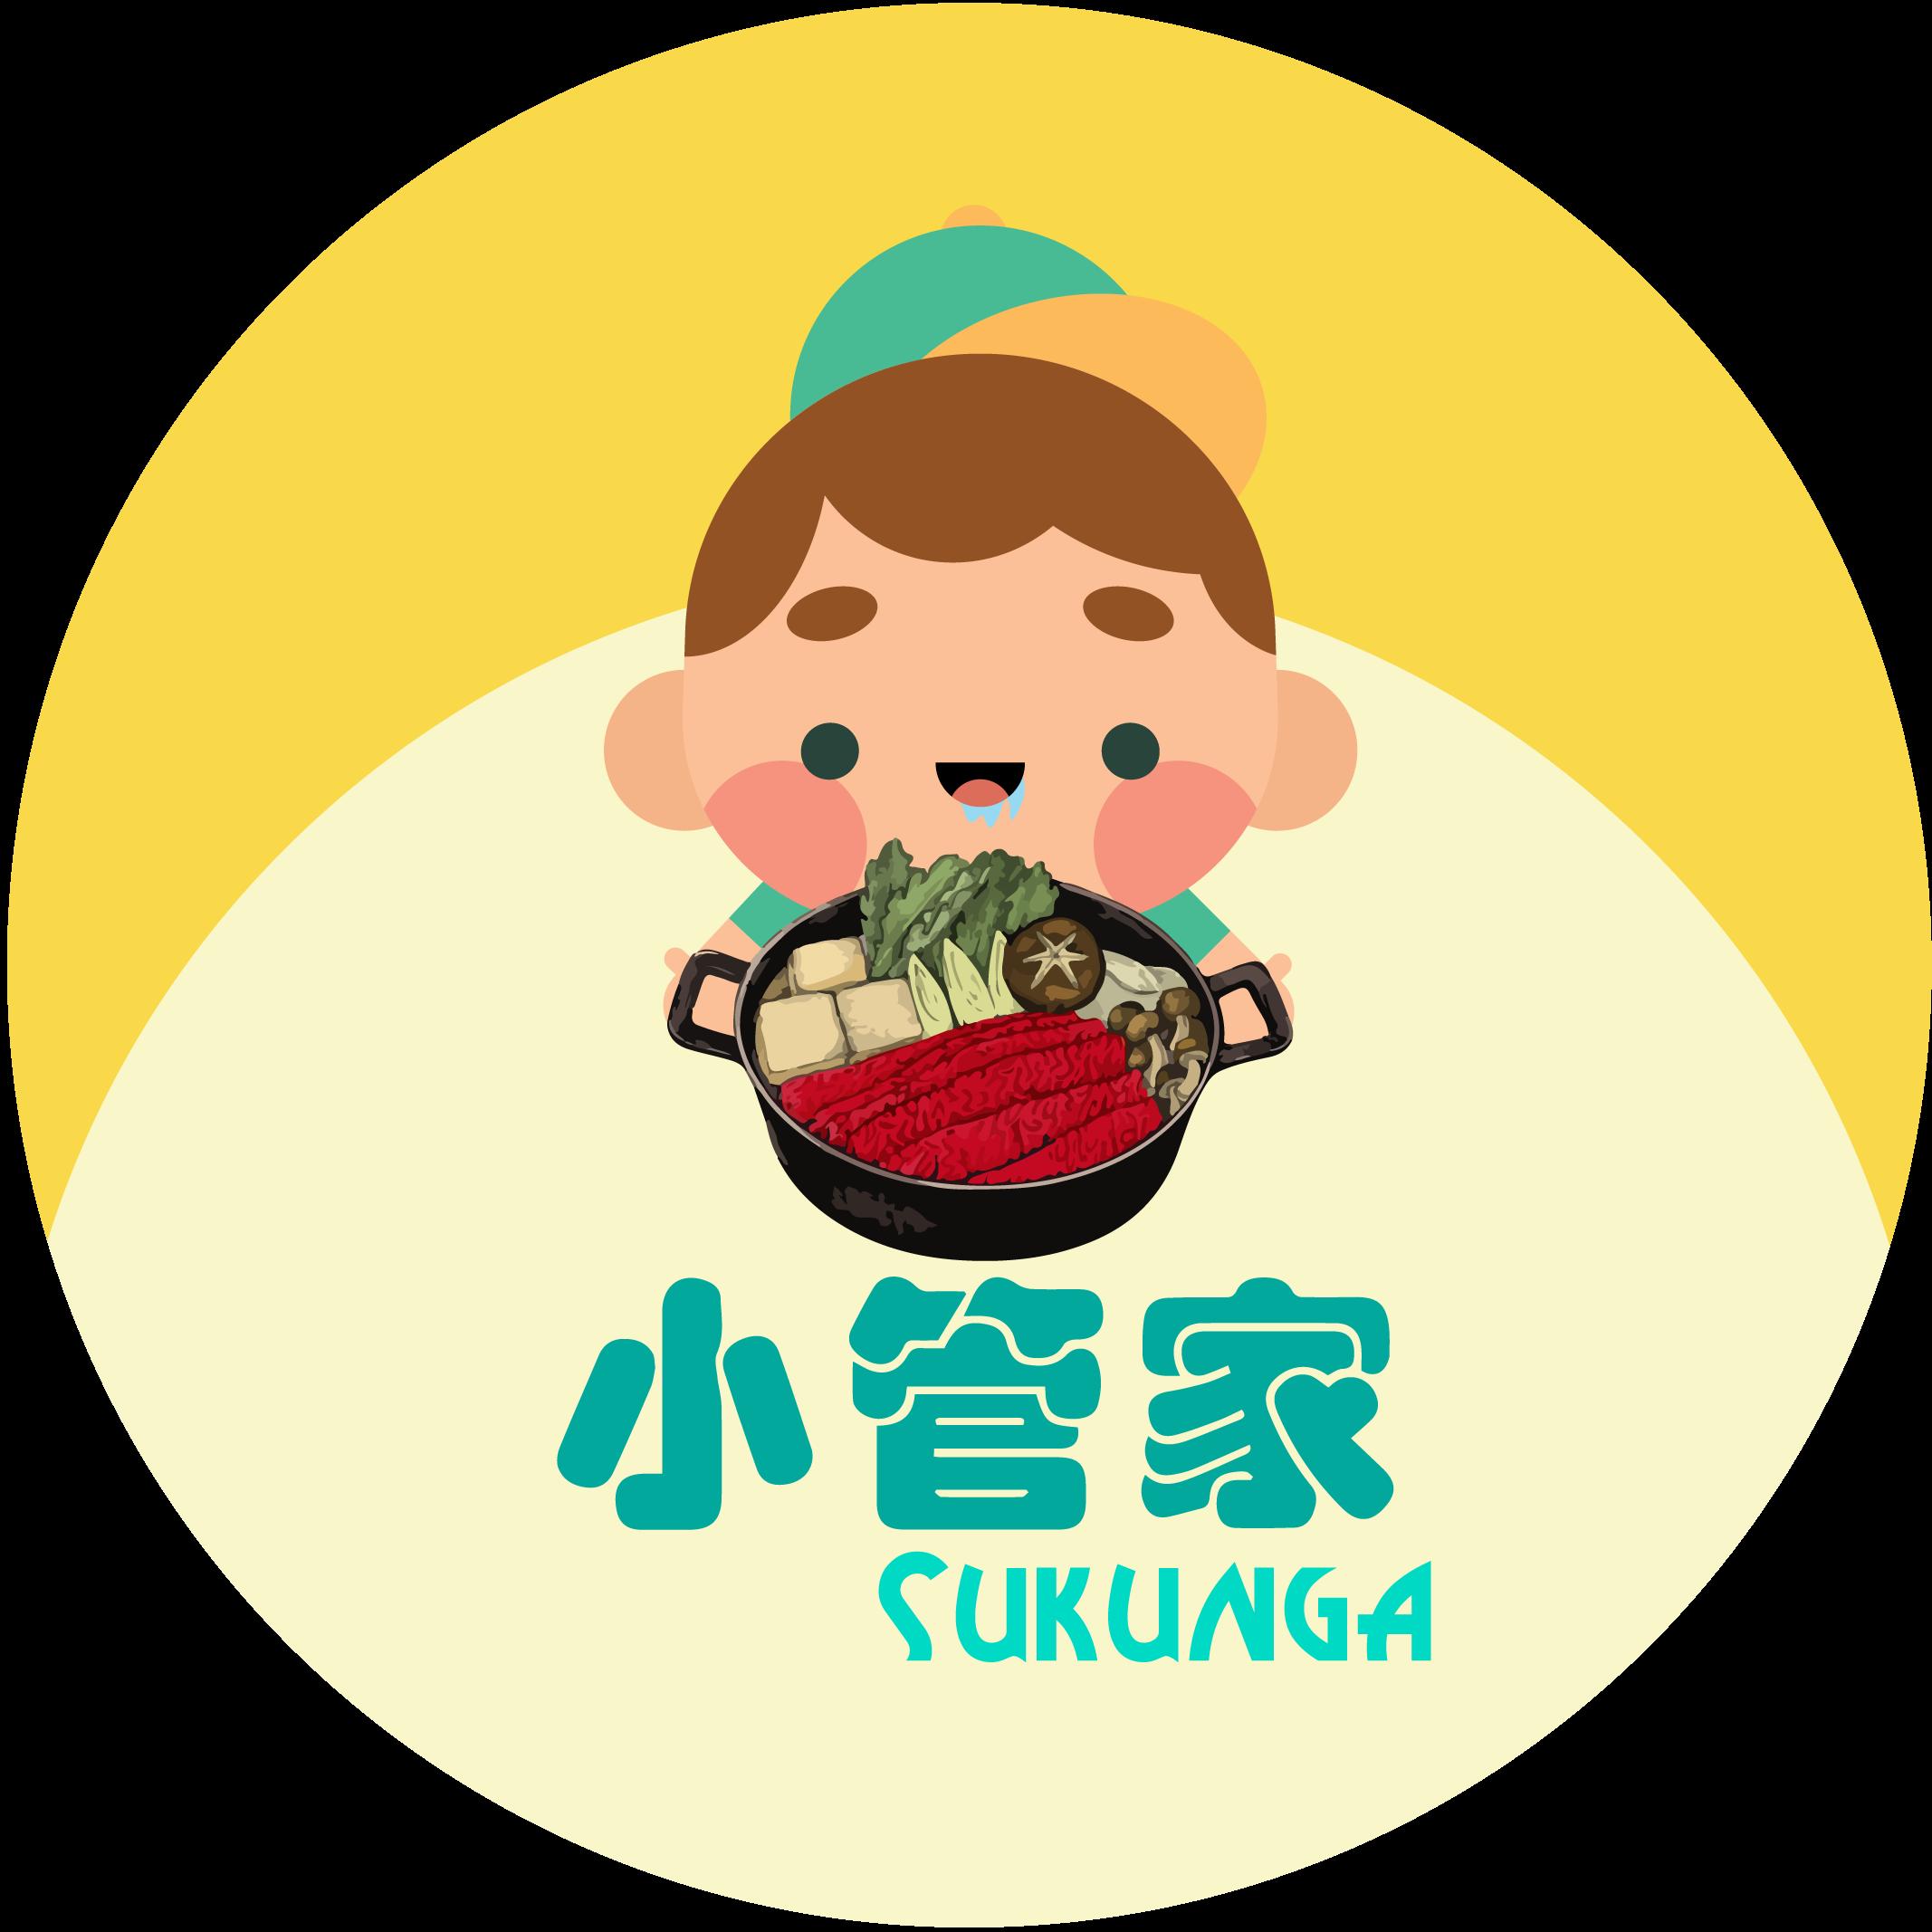 小管家外卖火锅 Sukunga Hotpot